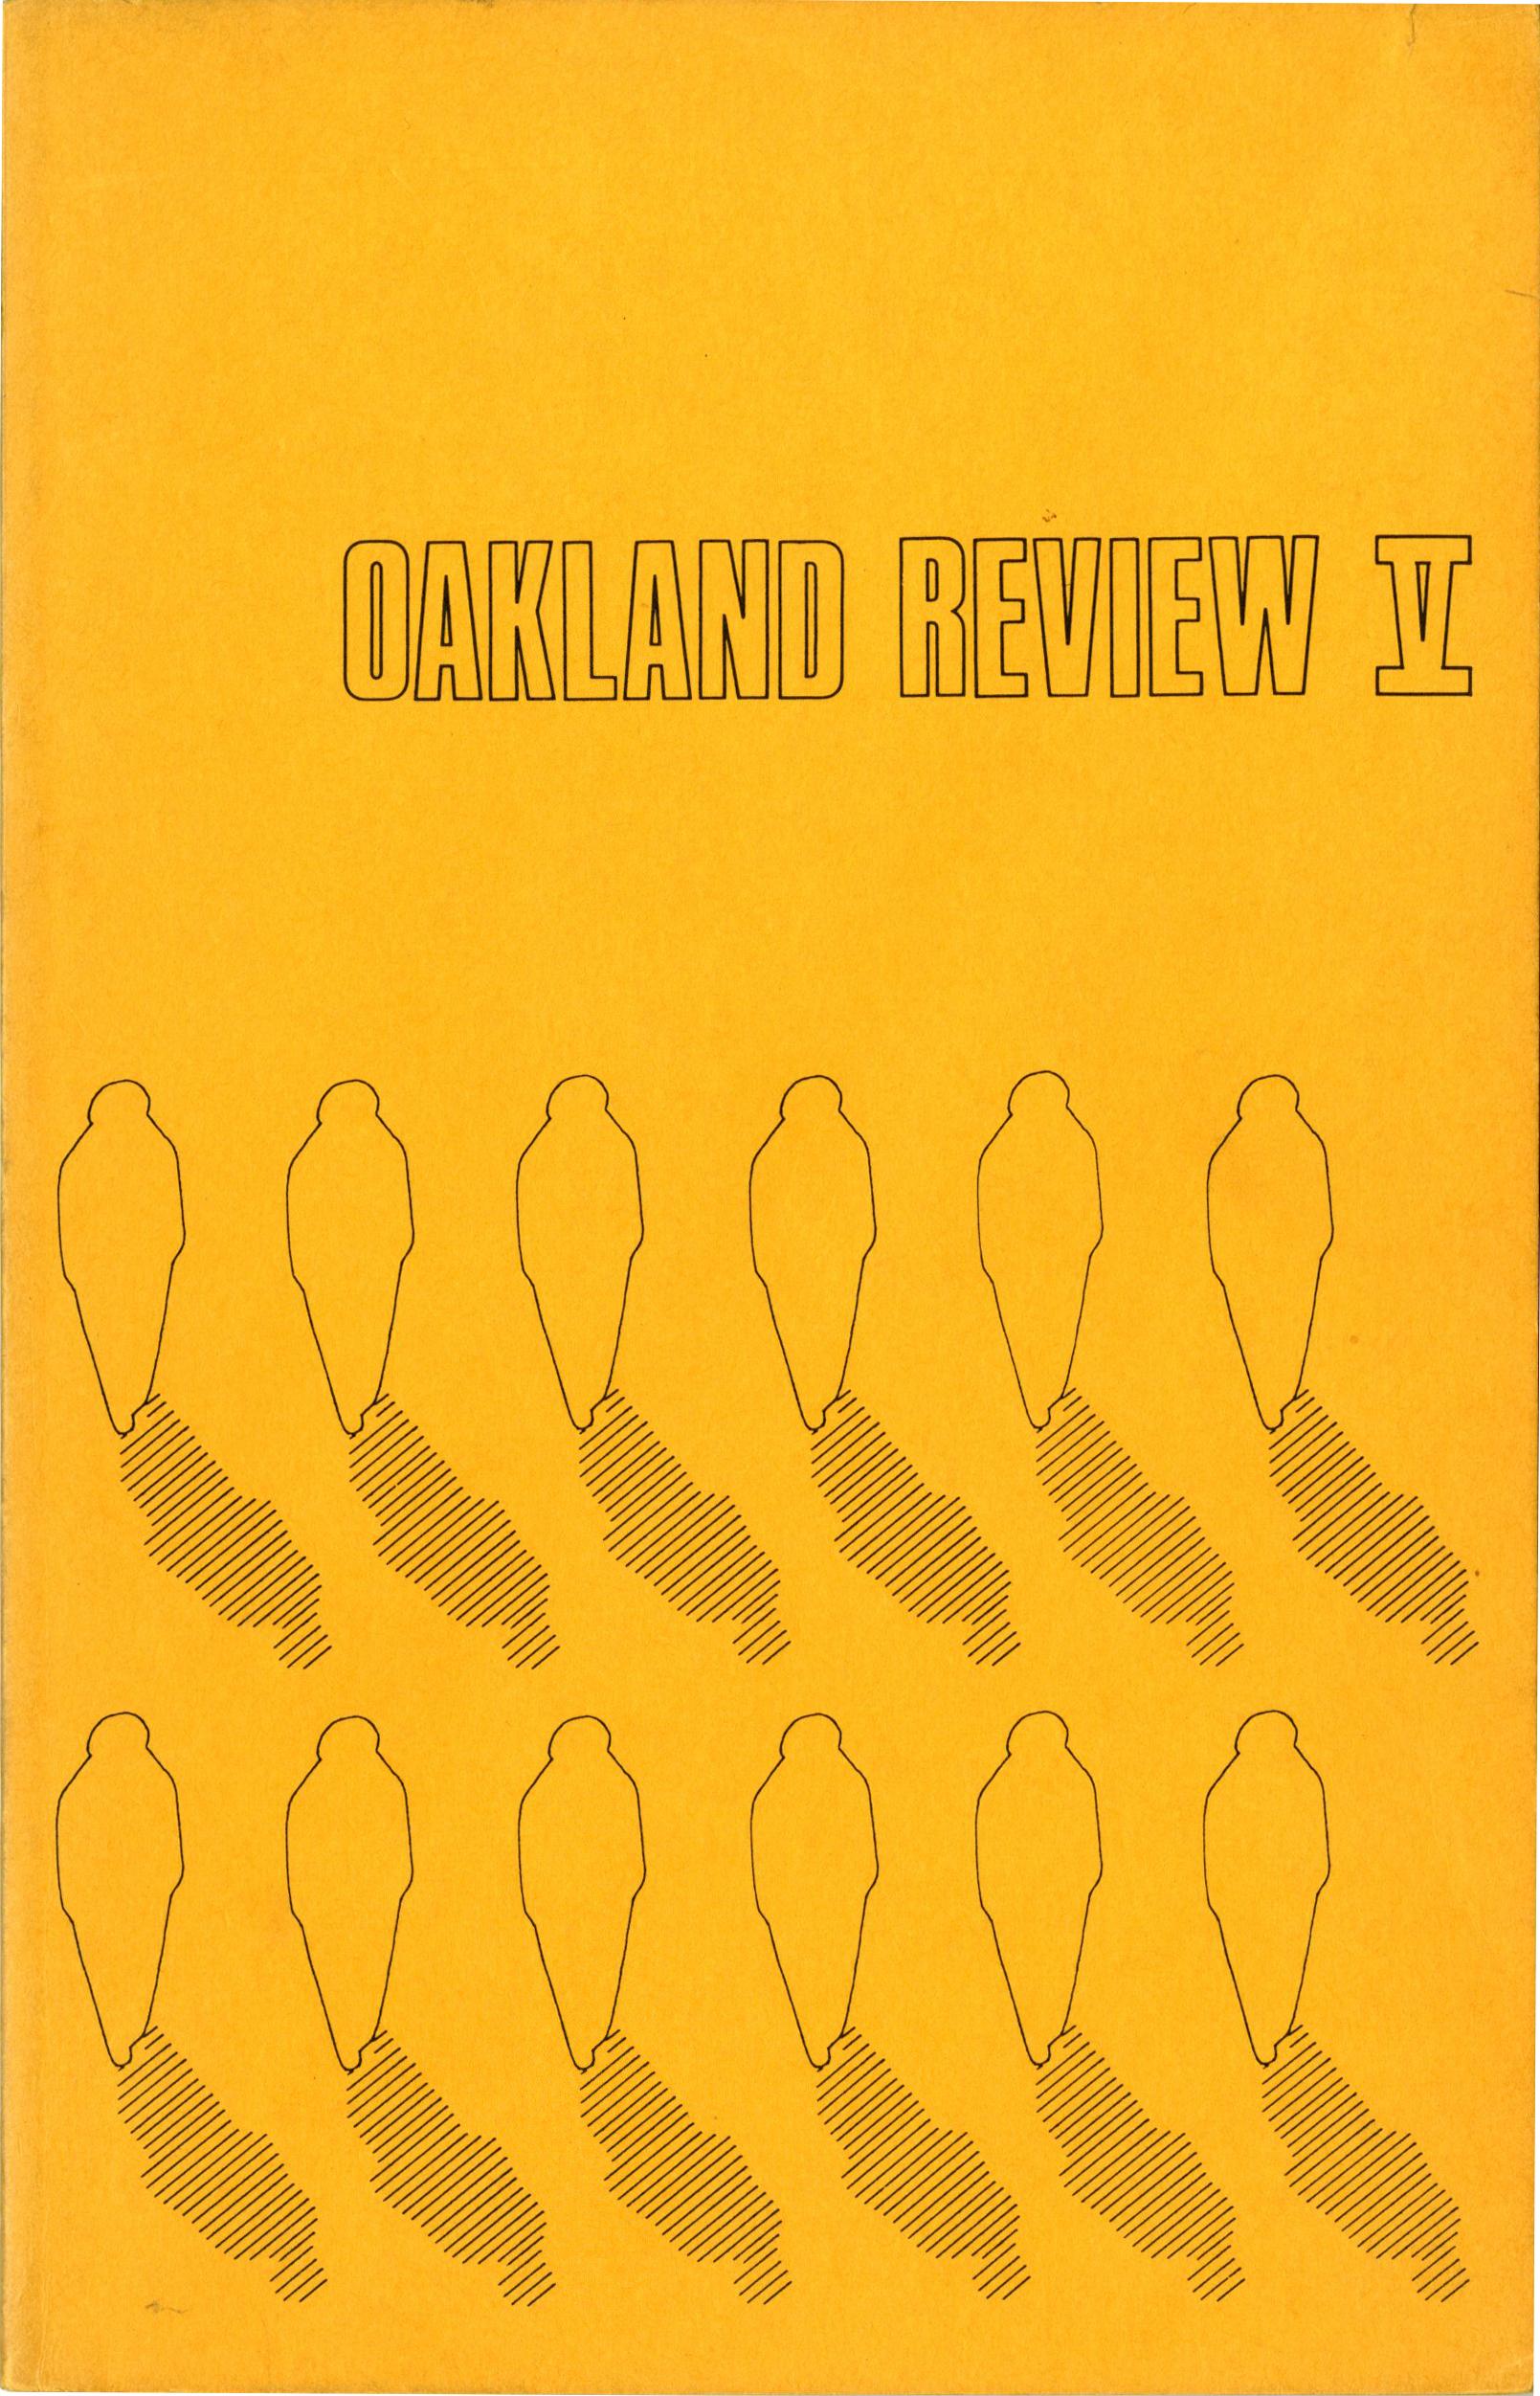 Volume V, Front (1977)